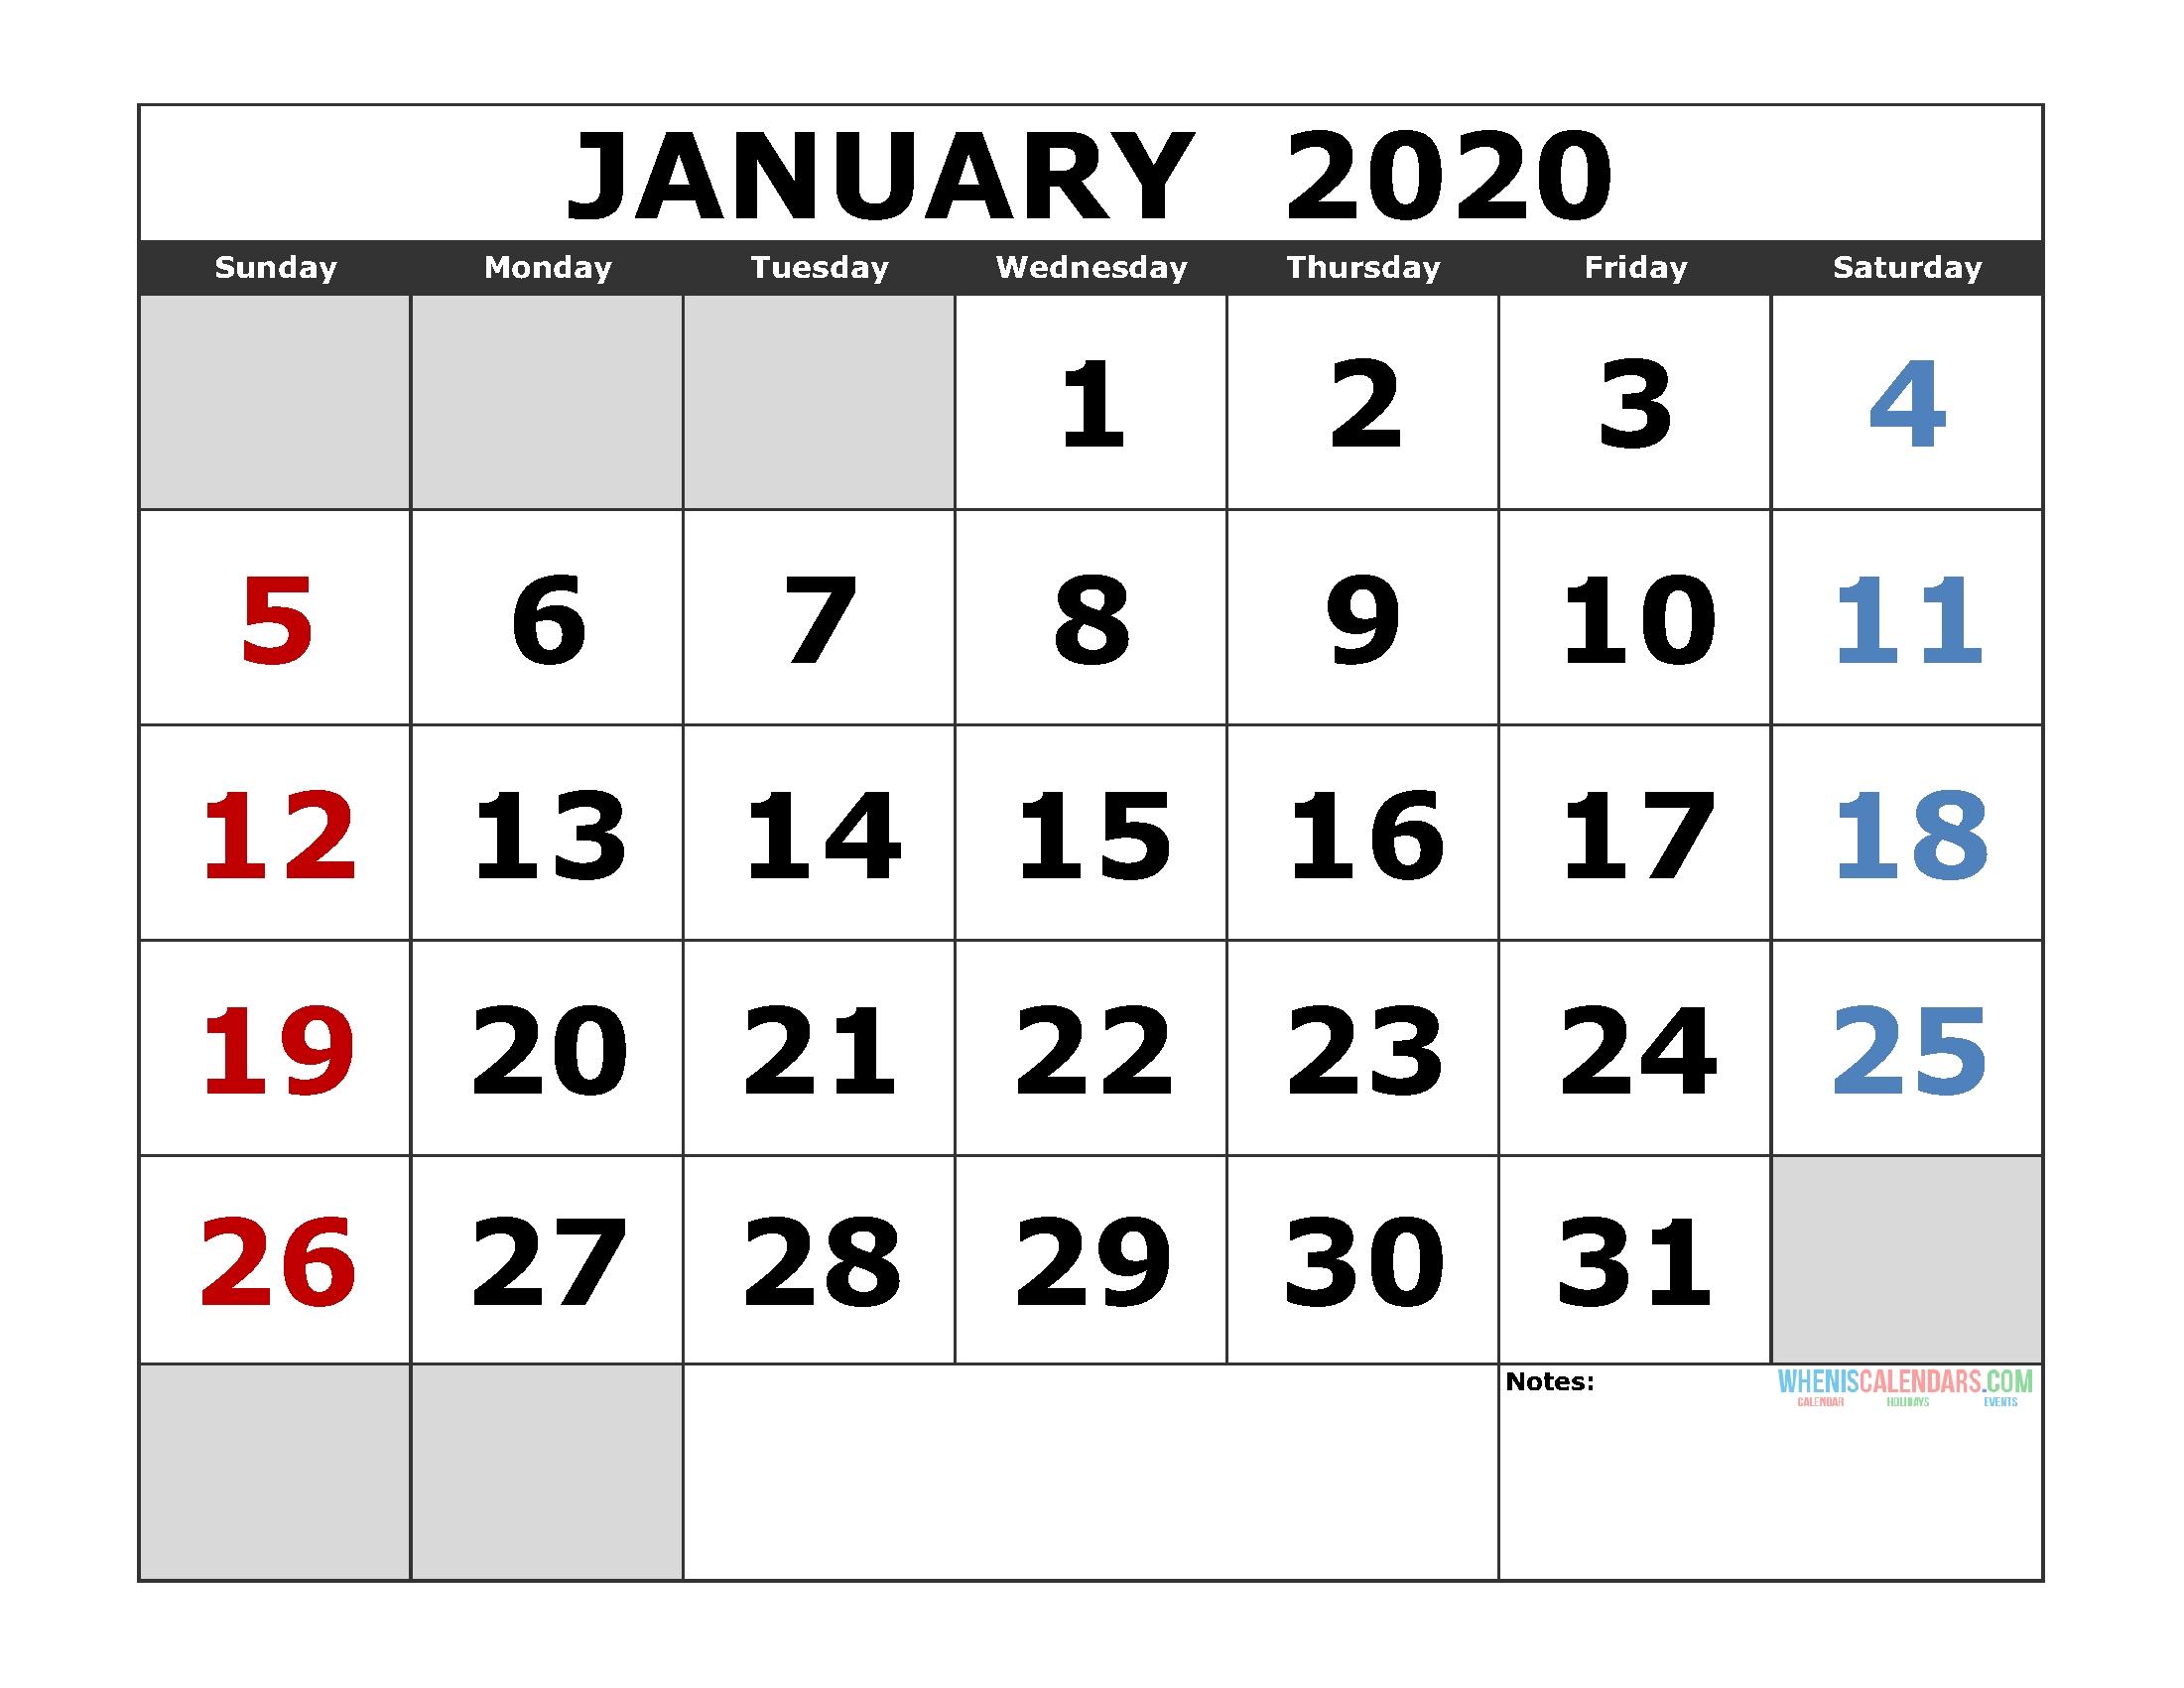 January 2020 Printable Calendar Template Excel, Pdf, Image-January 2020 Calendar Of Events